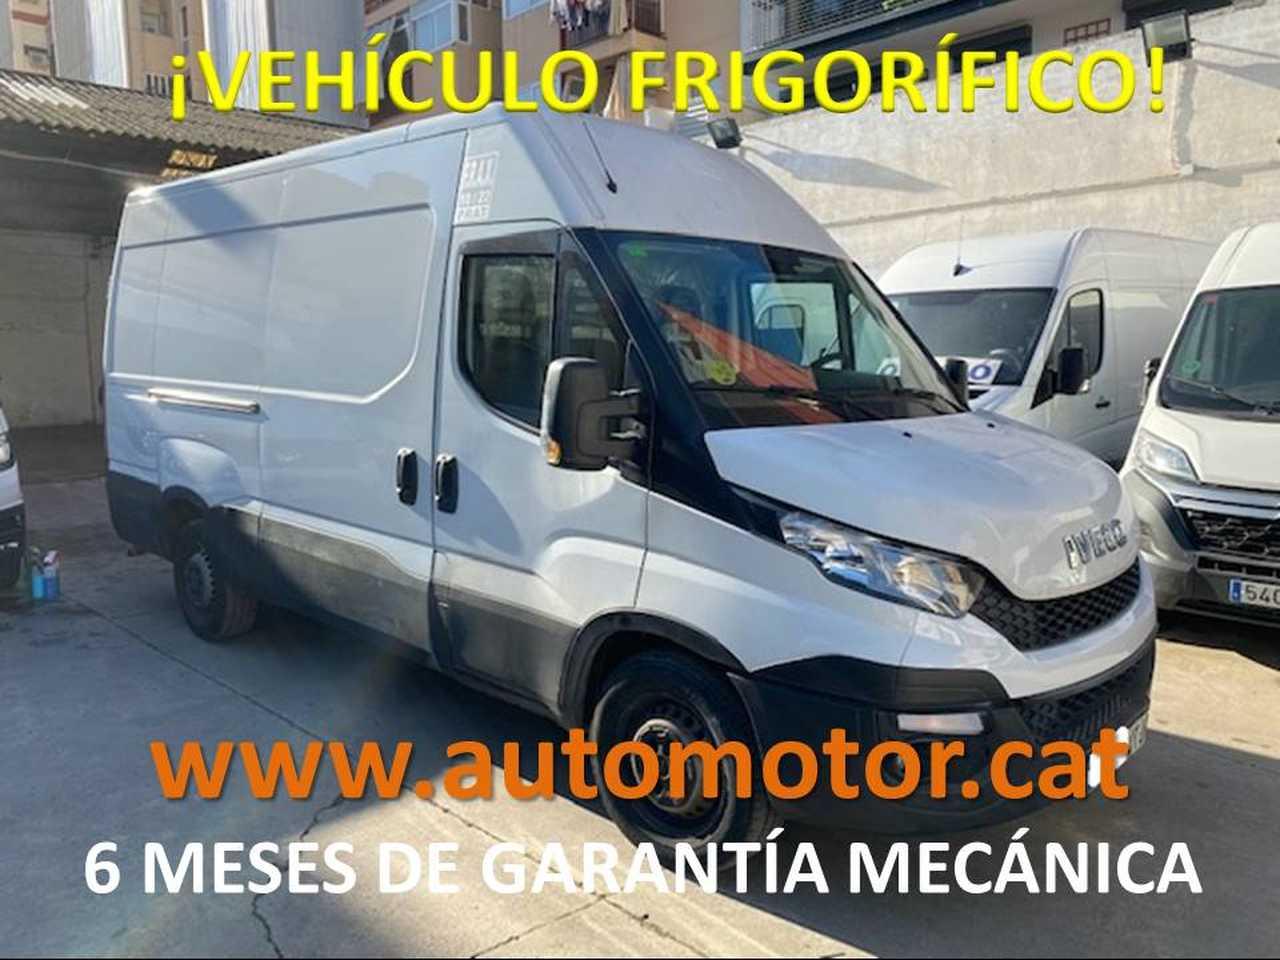 Iveco Daily Furgón 35S15 L2H2 FRIGORIFICO - GARANTIA FABRICA  - Foto 1